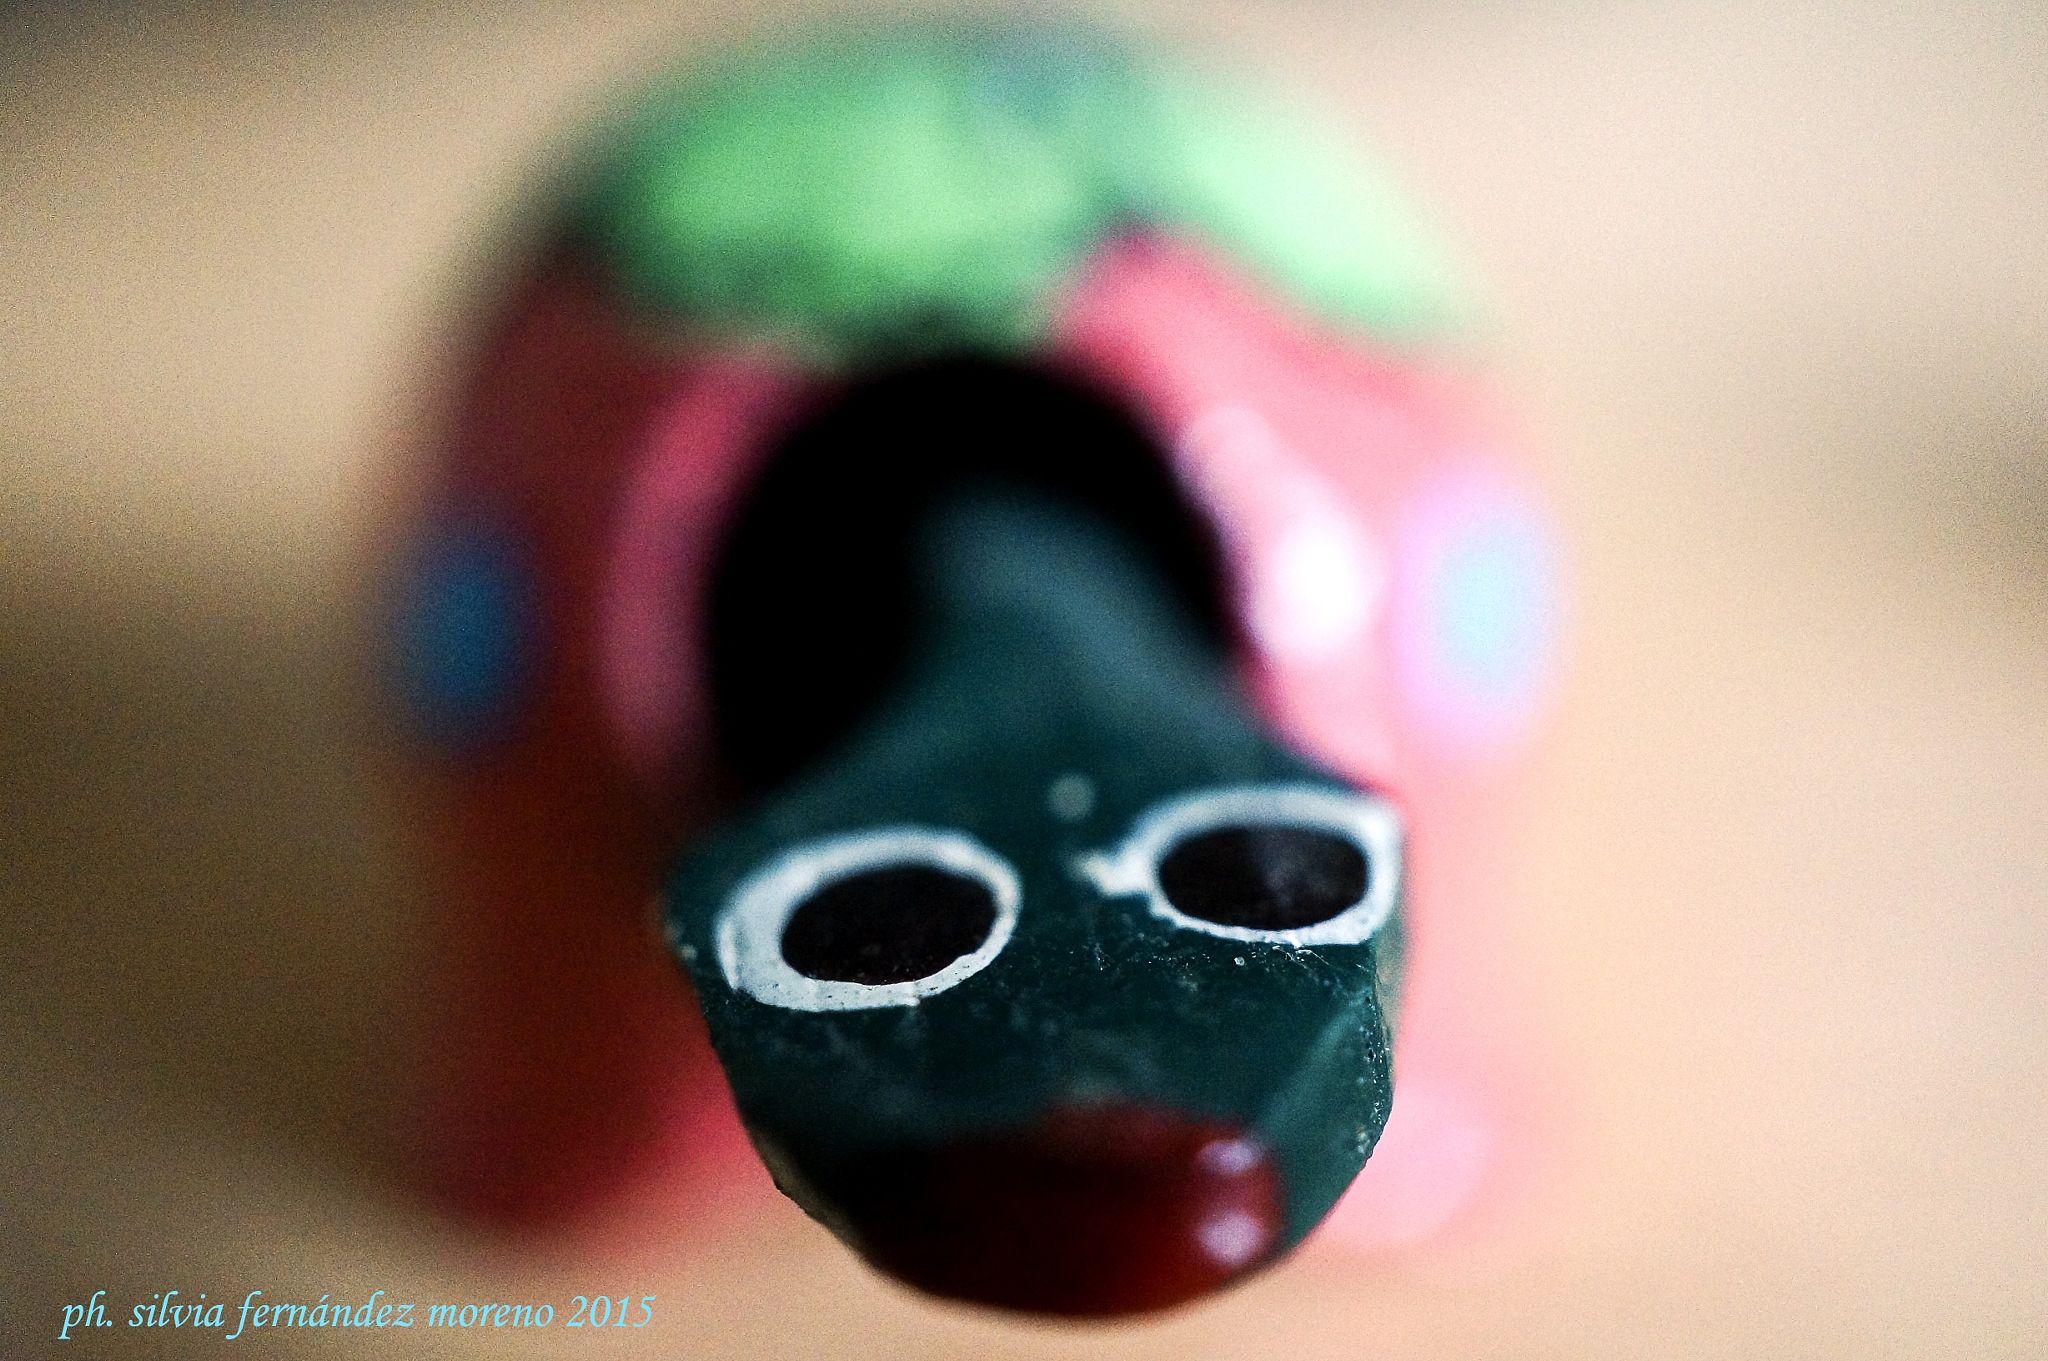 Paloma by Silvia Fernández Moreno on 500px #tortuga #turtle #deco #miniaturas #miniature #anteojos #lenses #dof #photography #craft